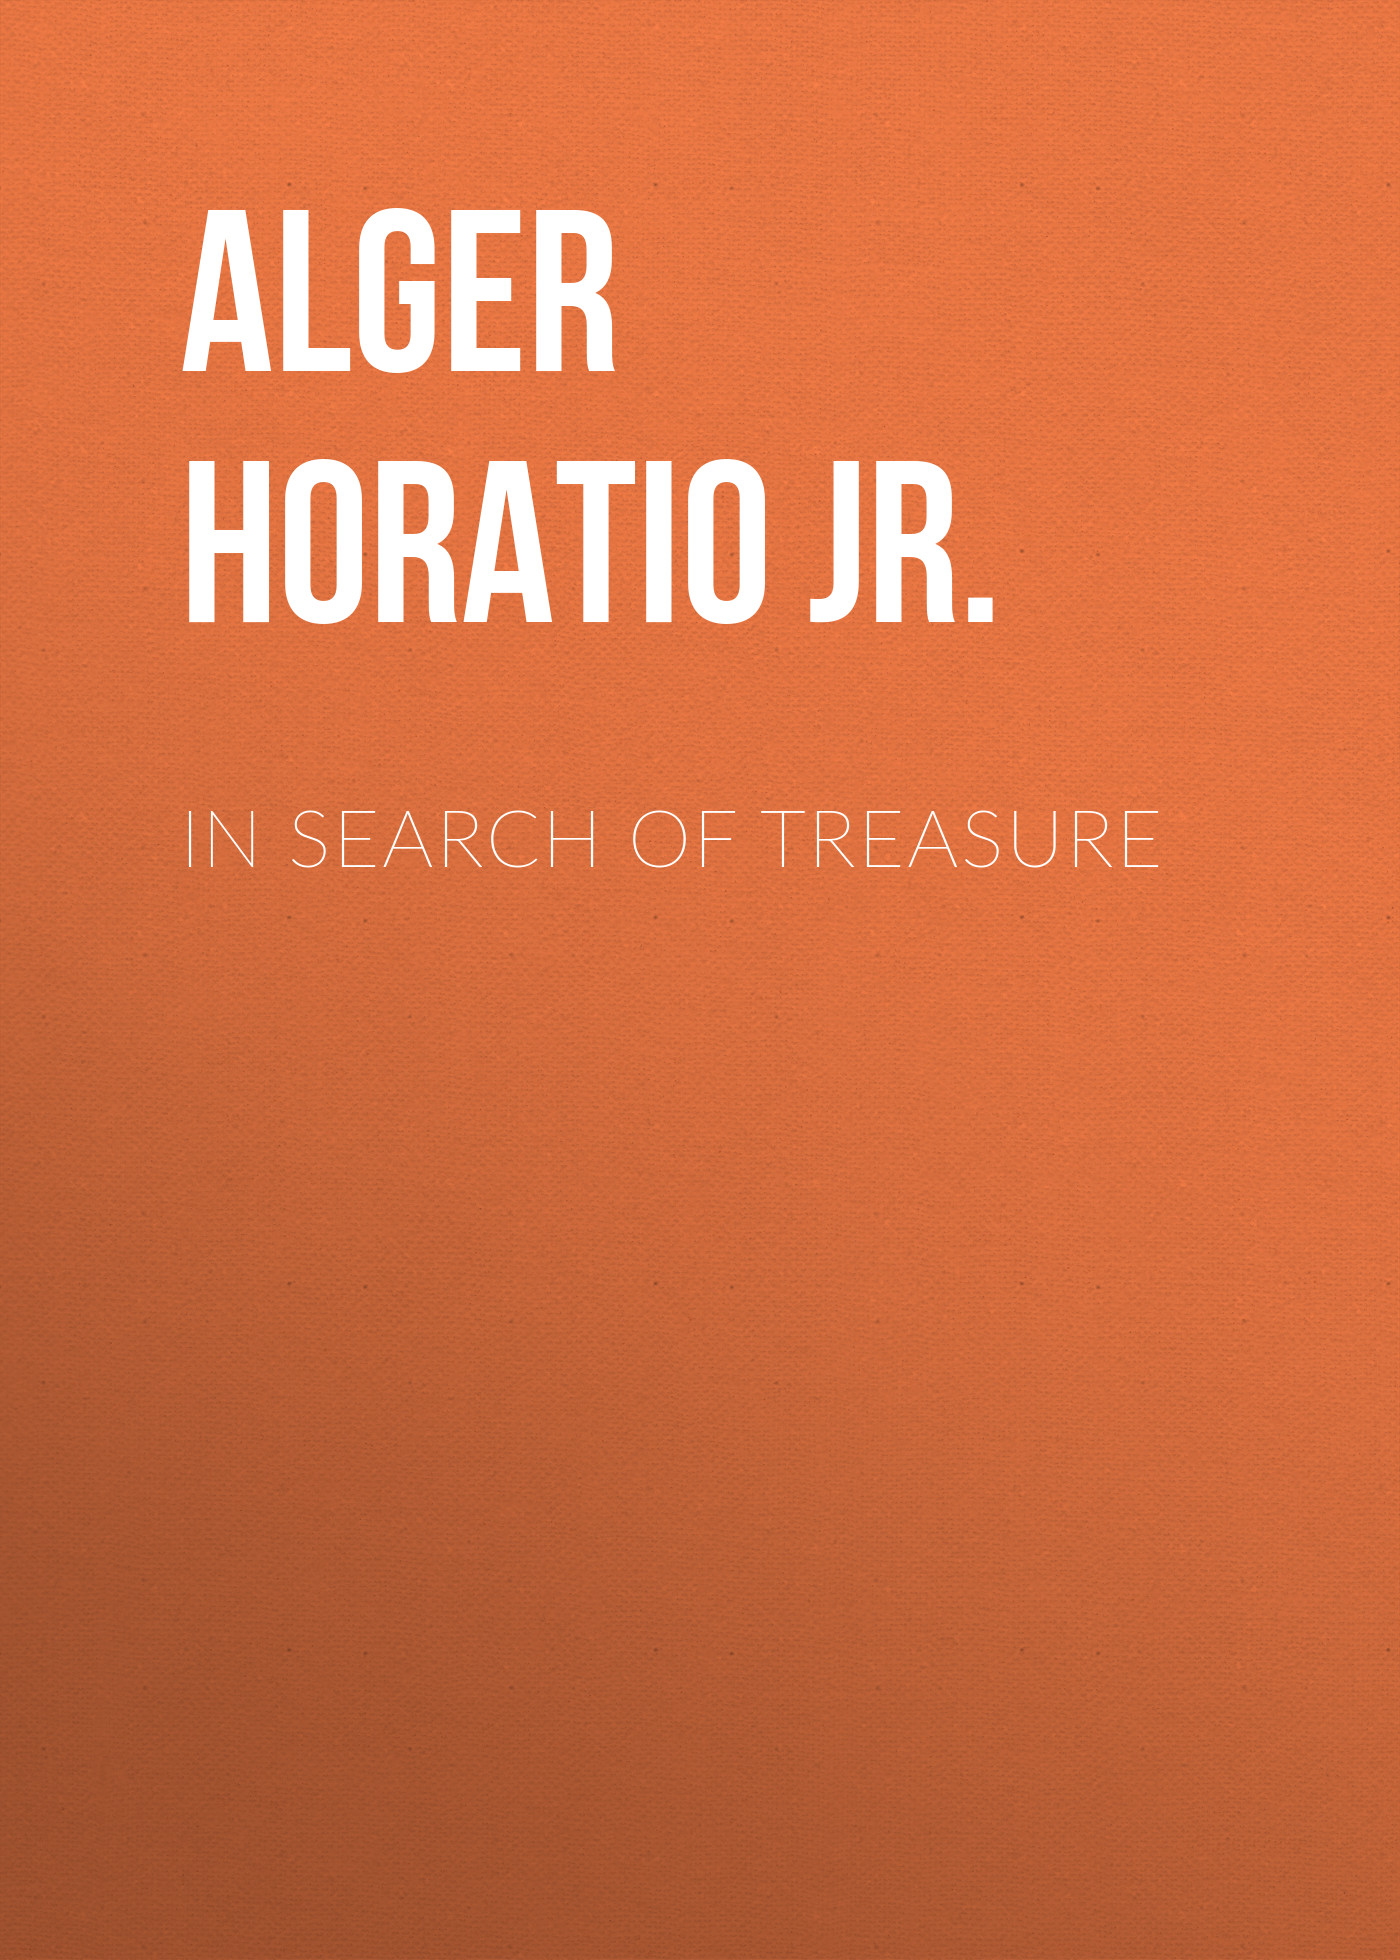 Alger Horatio Jr. In Search of Treasure полотенце махровое мойдодыр 40х70